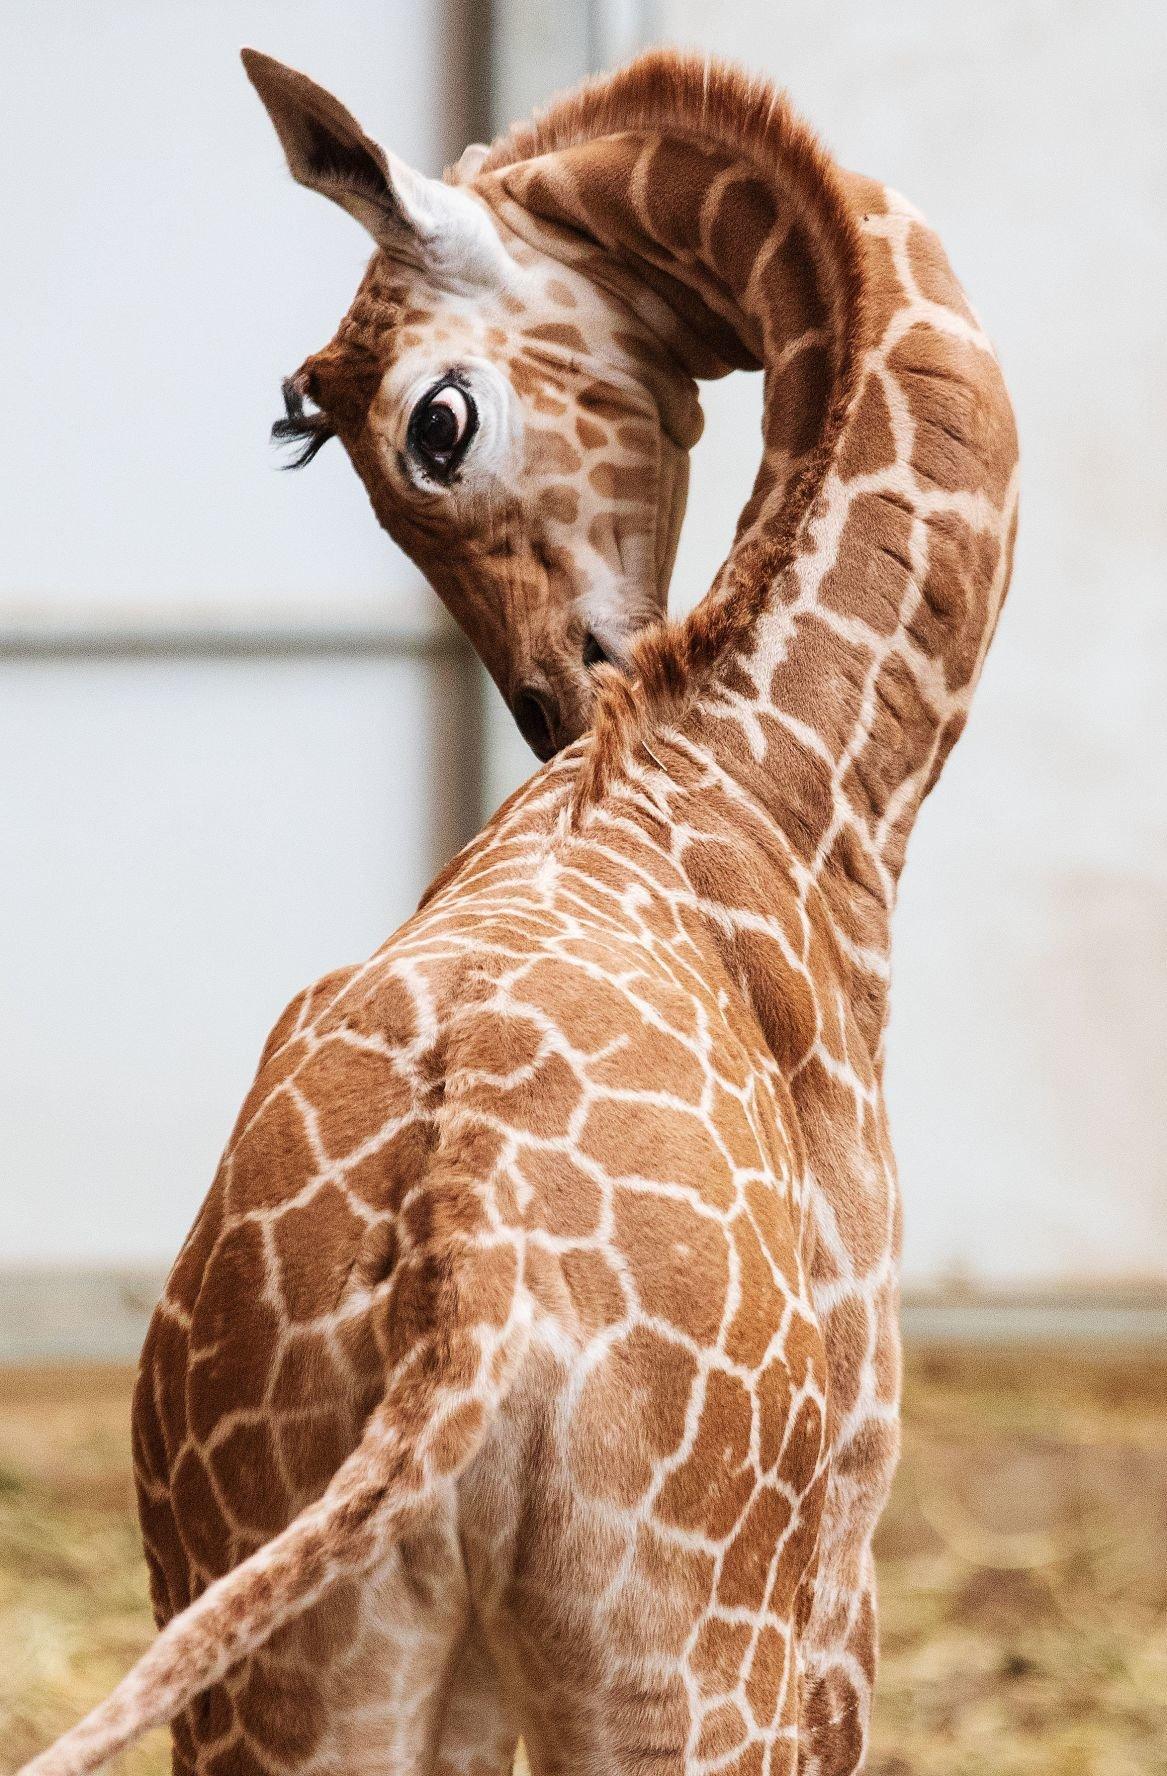 20190424_new_giraffe_pic8 (copy))))